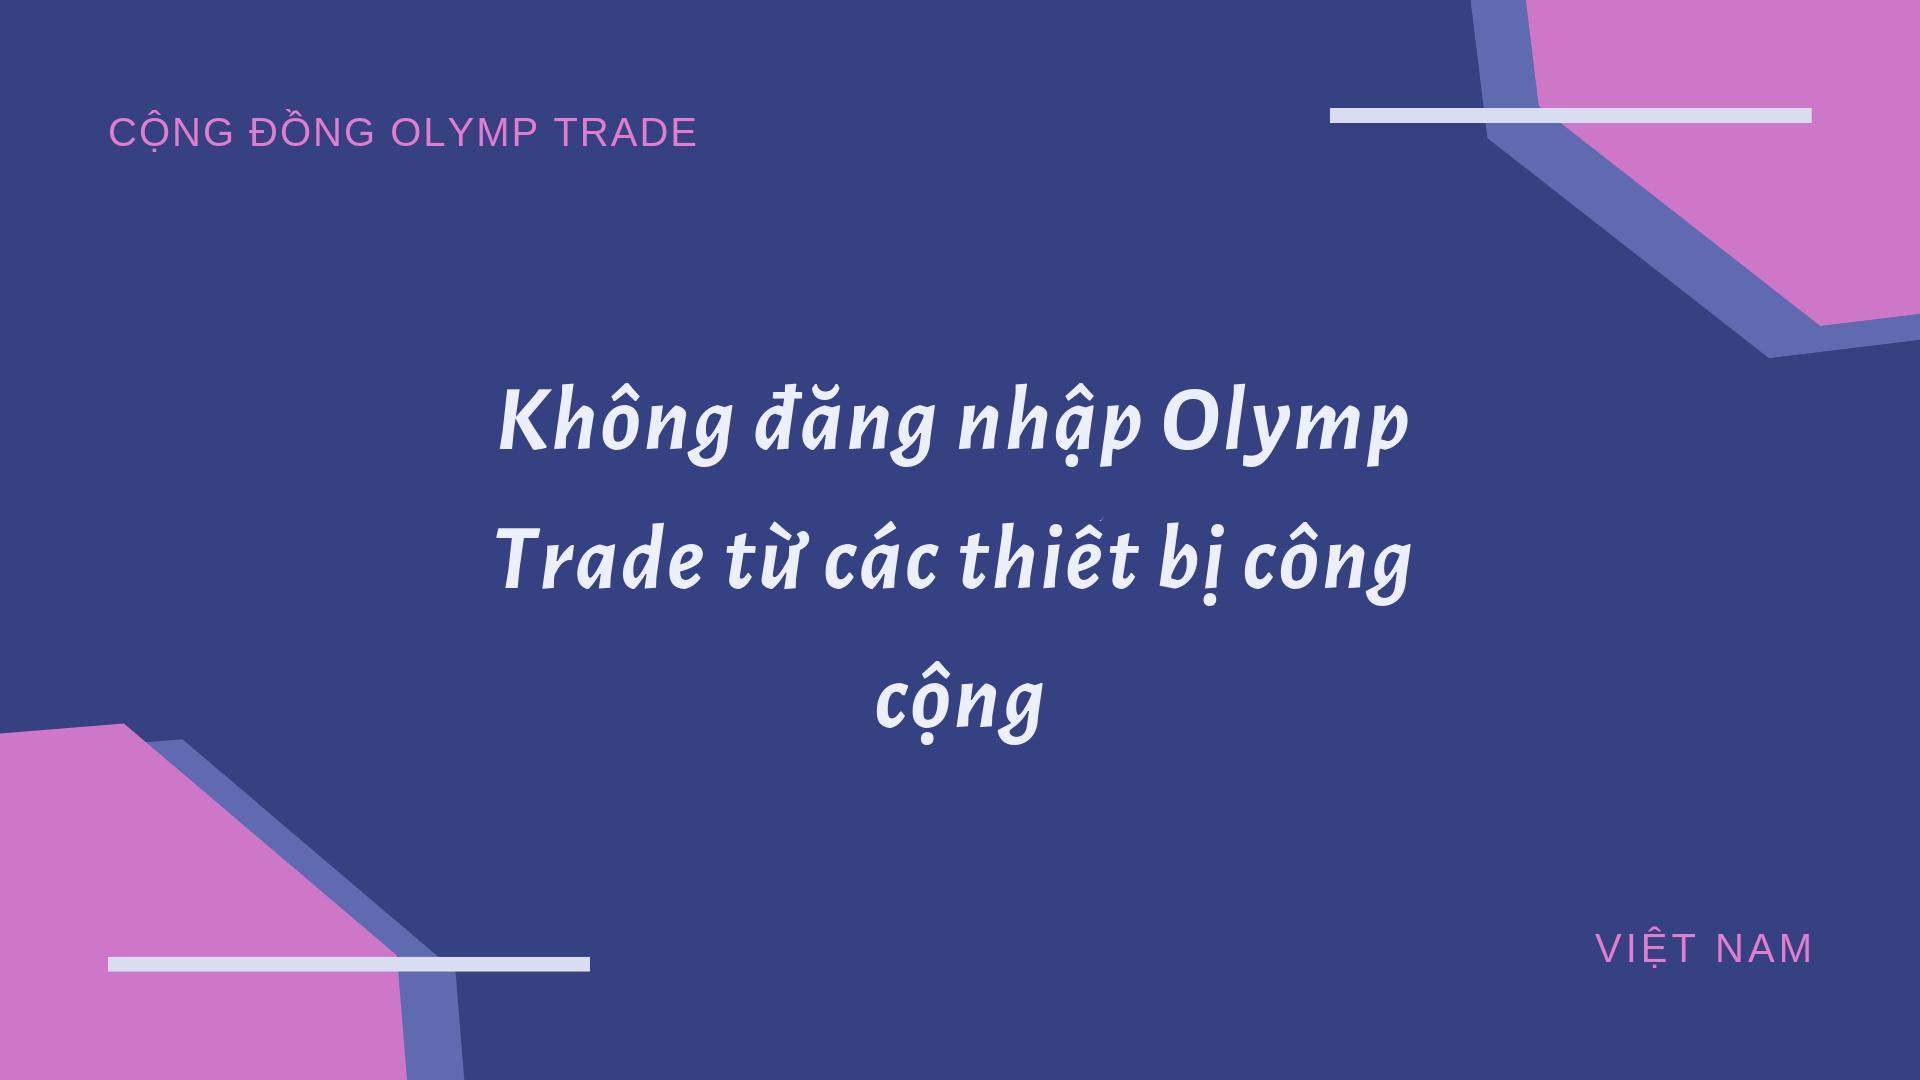 dang-nhap-olymp-trade-bang-thiet-bi-cong-cong